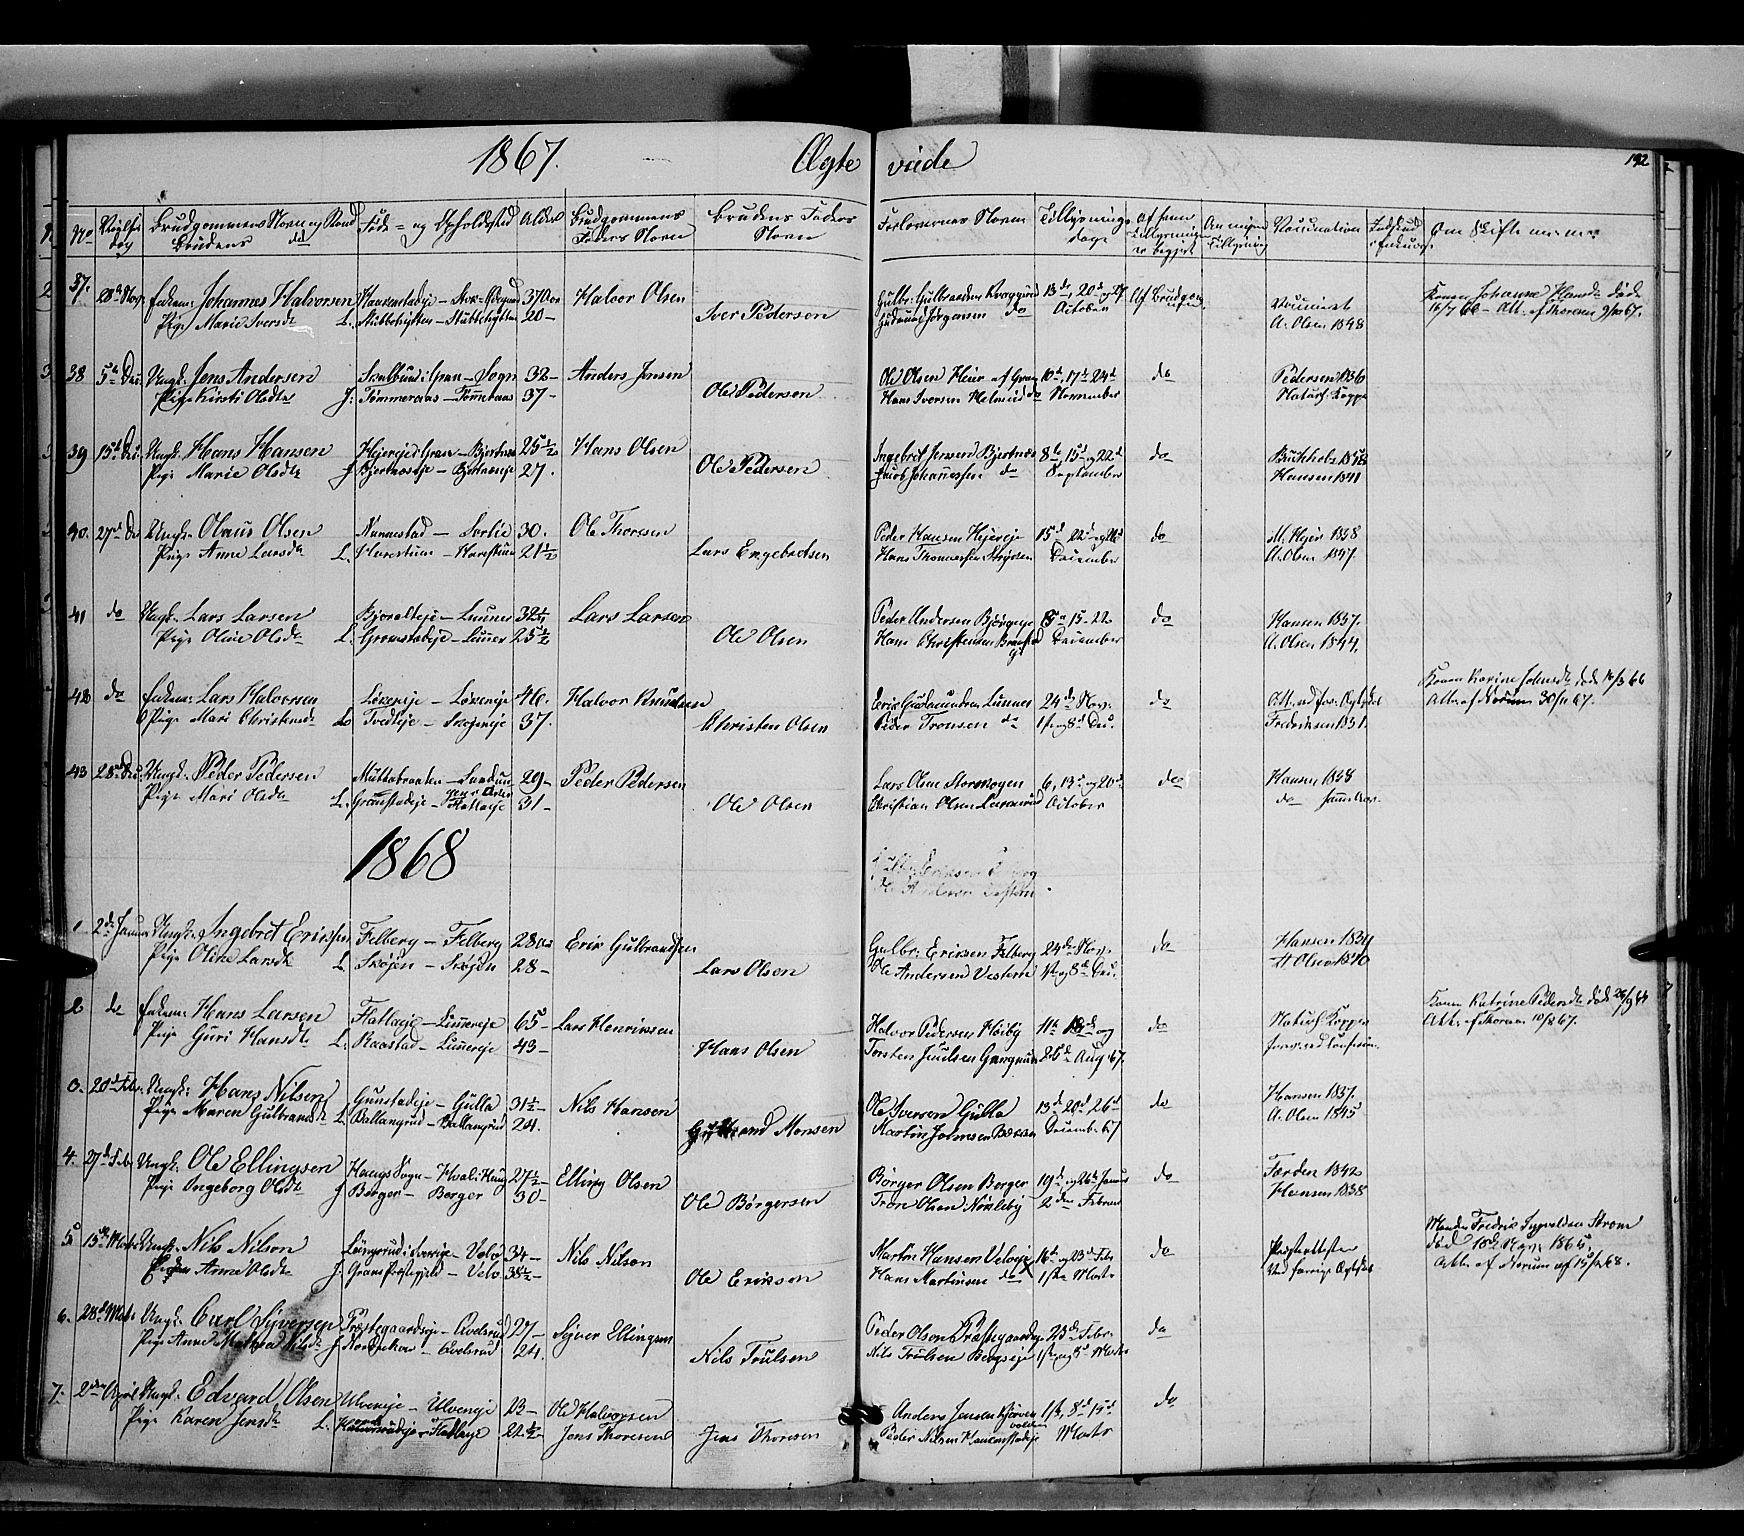 SAH, Jevnaker prestekontor, Ministerialbok nr. 7, 1858-1876, s. 192